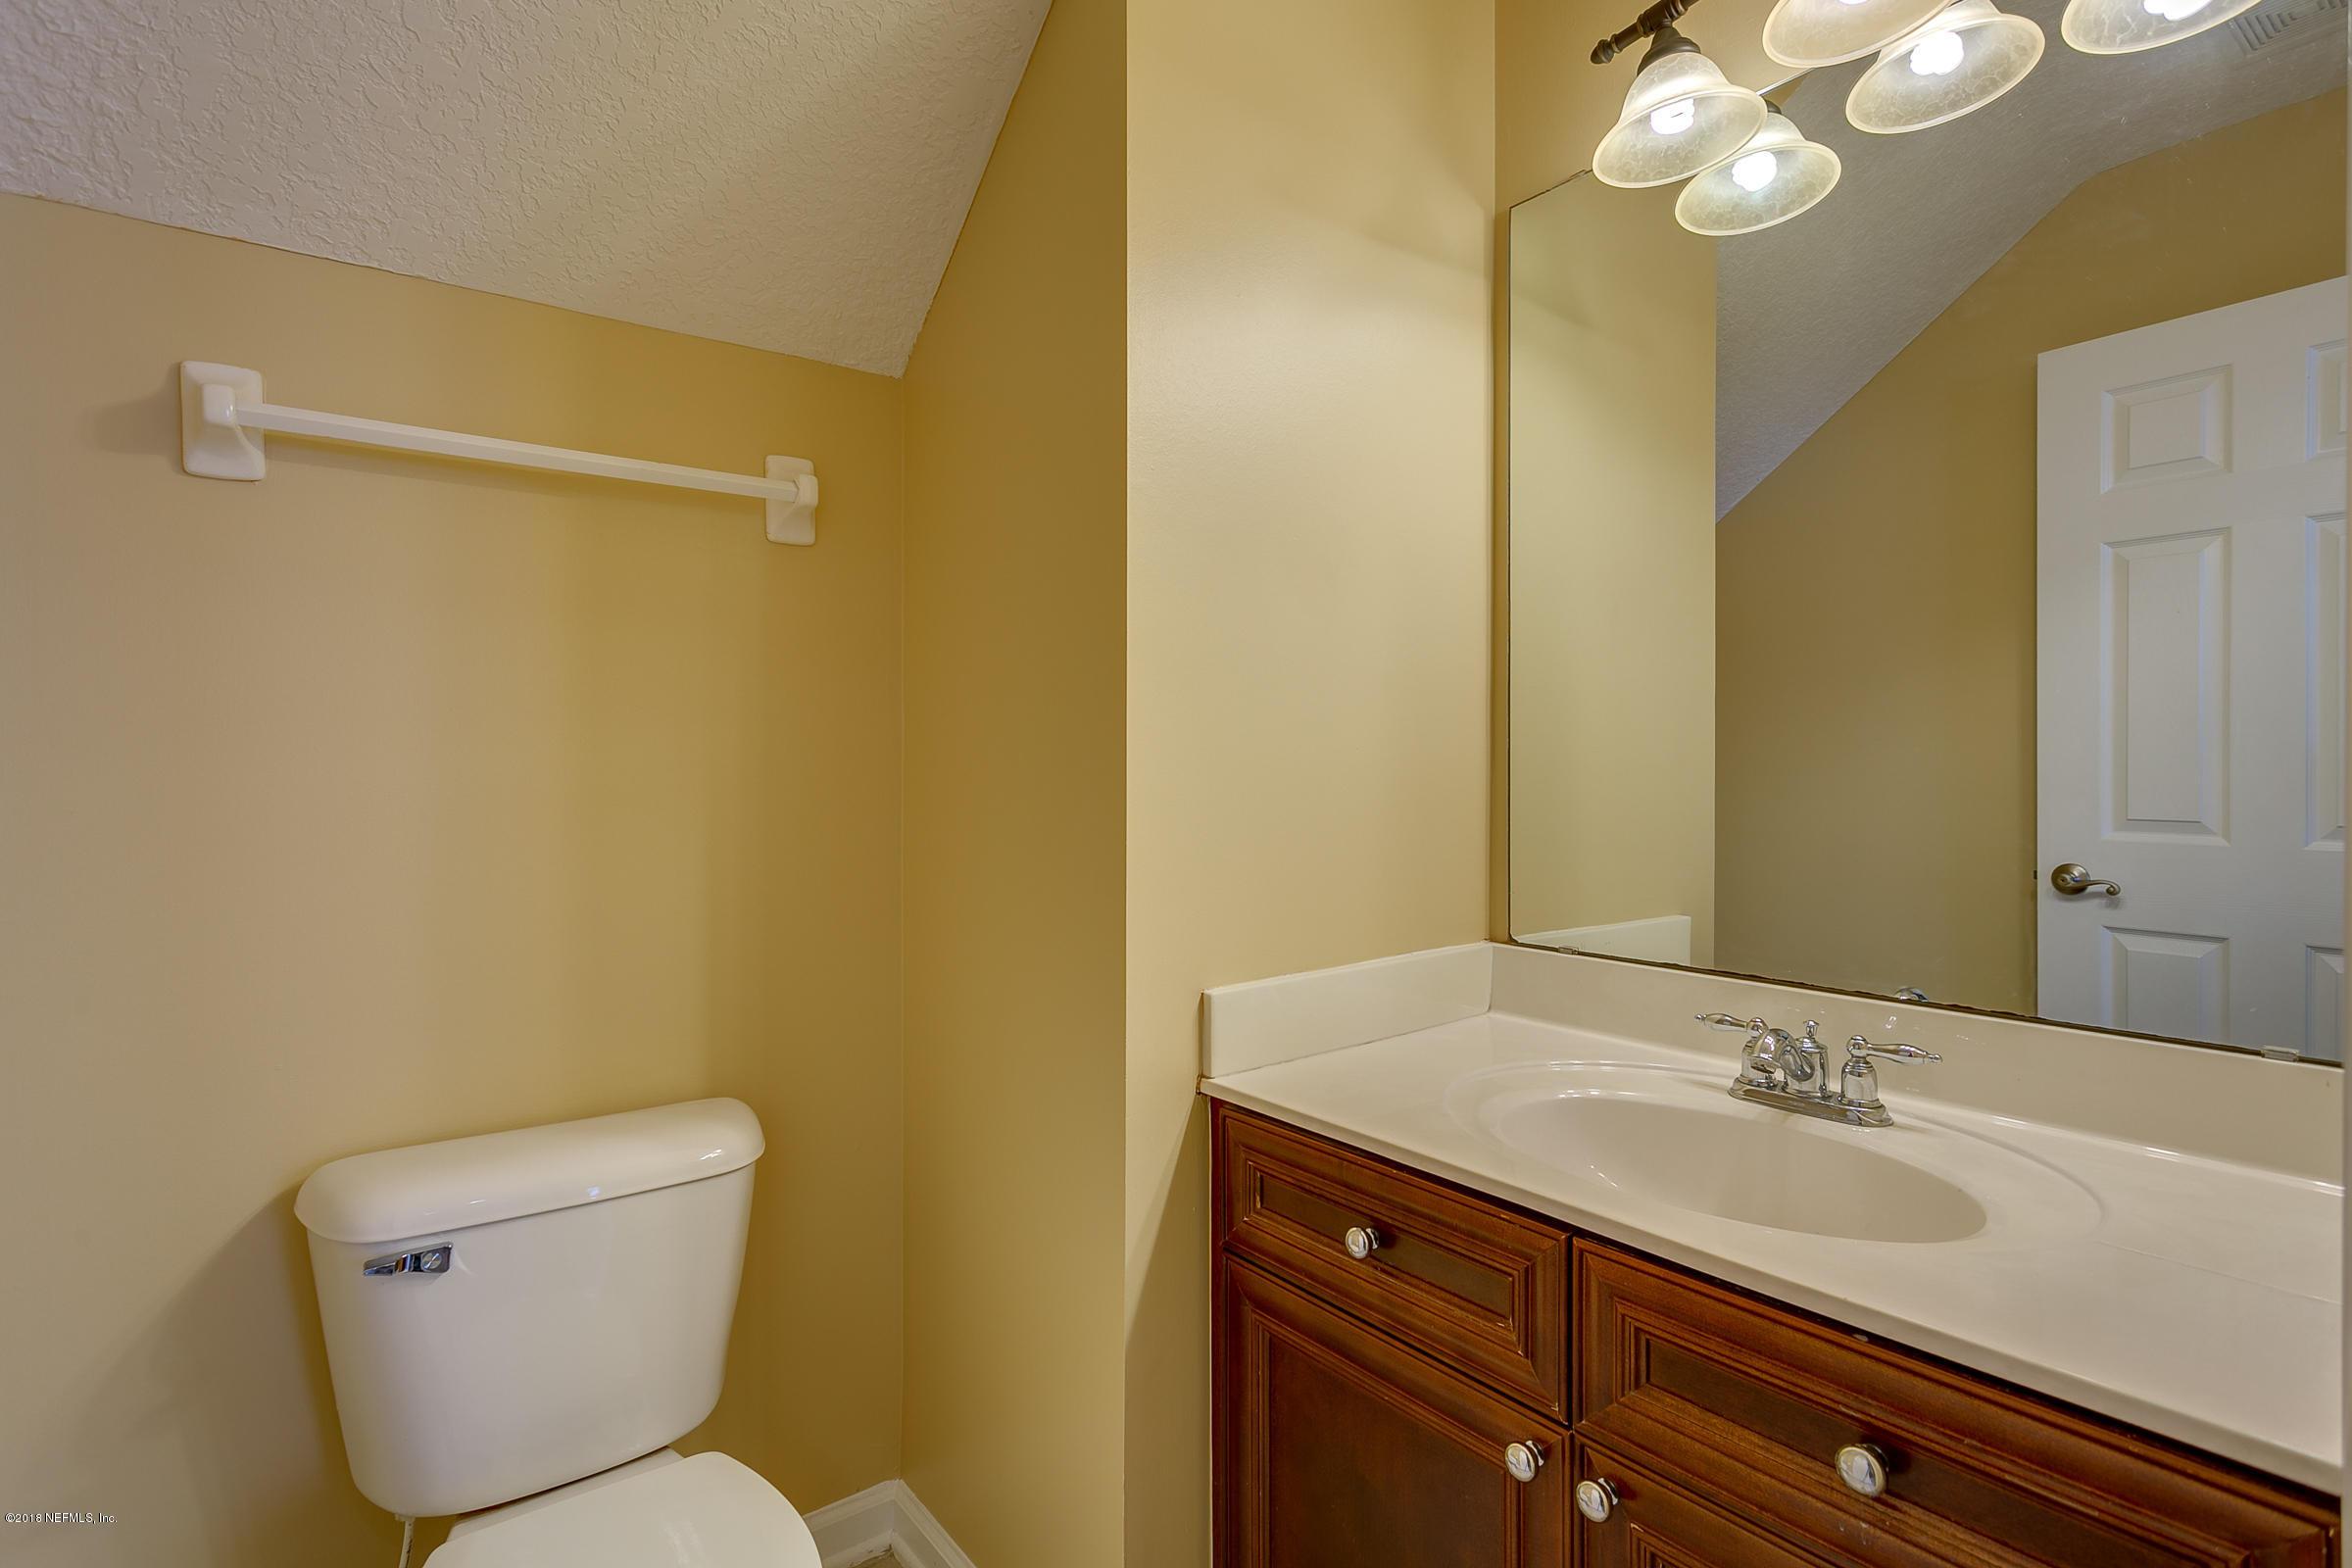 1465 SHADOW CREEK, ORANGE PARK, FLORIDA 32065, 4 Bedrooms Bedrooms, ,2 BathroomsBathrooms,Residential - single family,For sale,SHADOW CREEK,953400